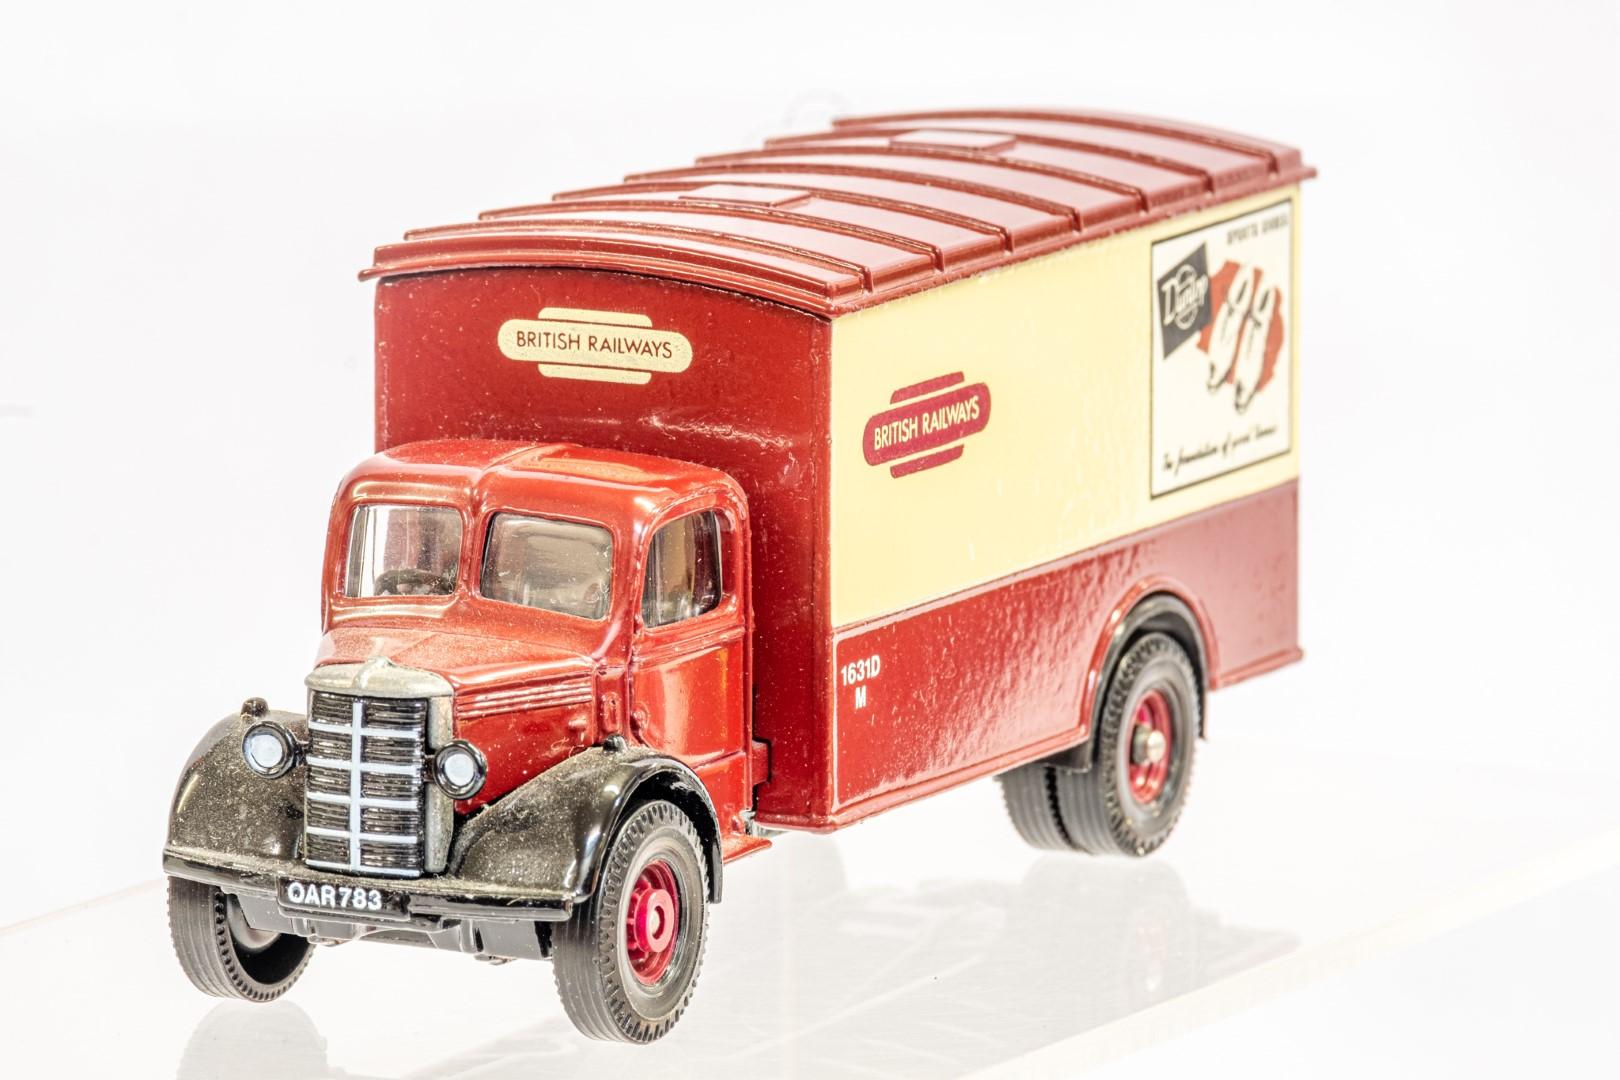 Corgi & Lledo 2 Boxed Models - Service Vans Of the 50's & 60's & Sentinel Ballast - Image 9 of 12